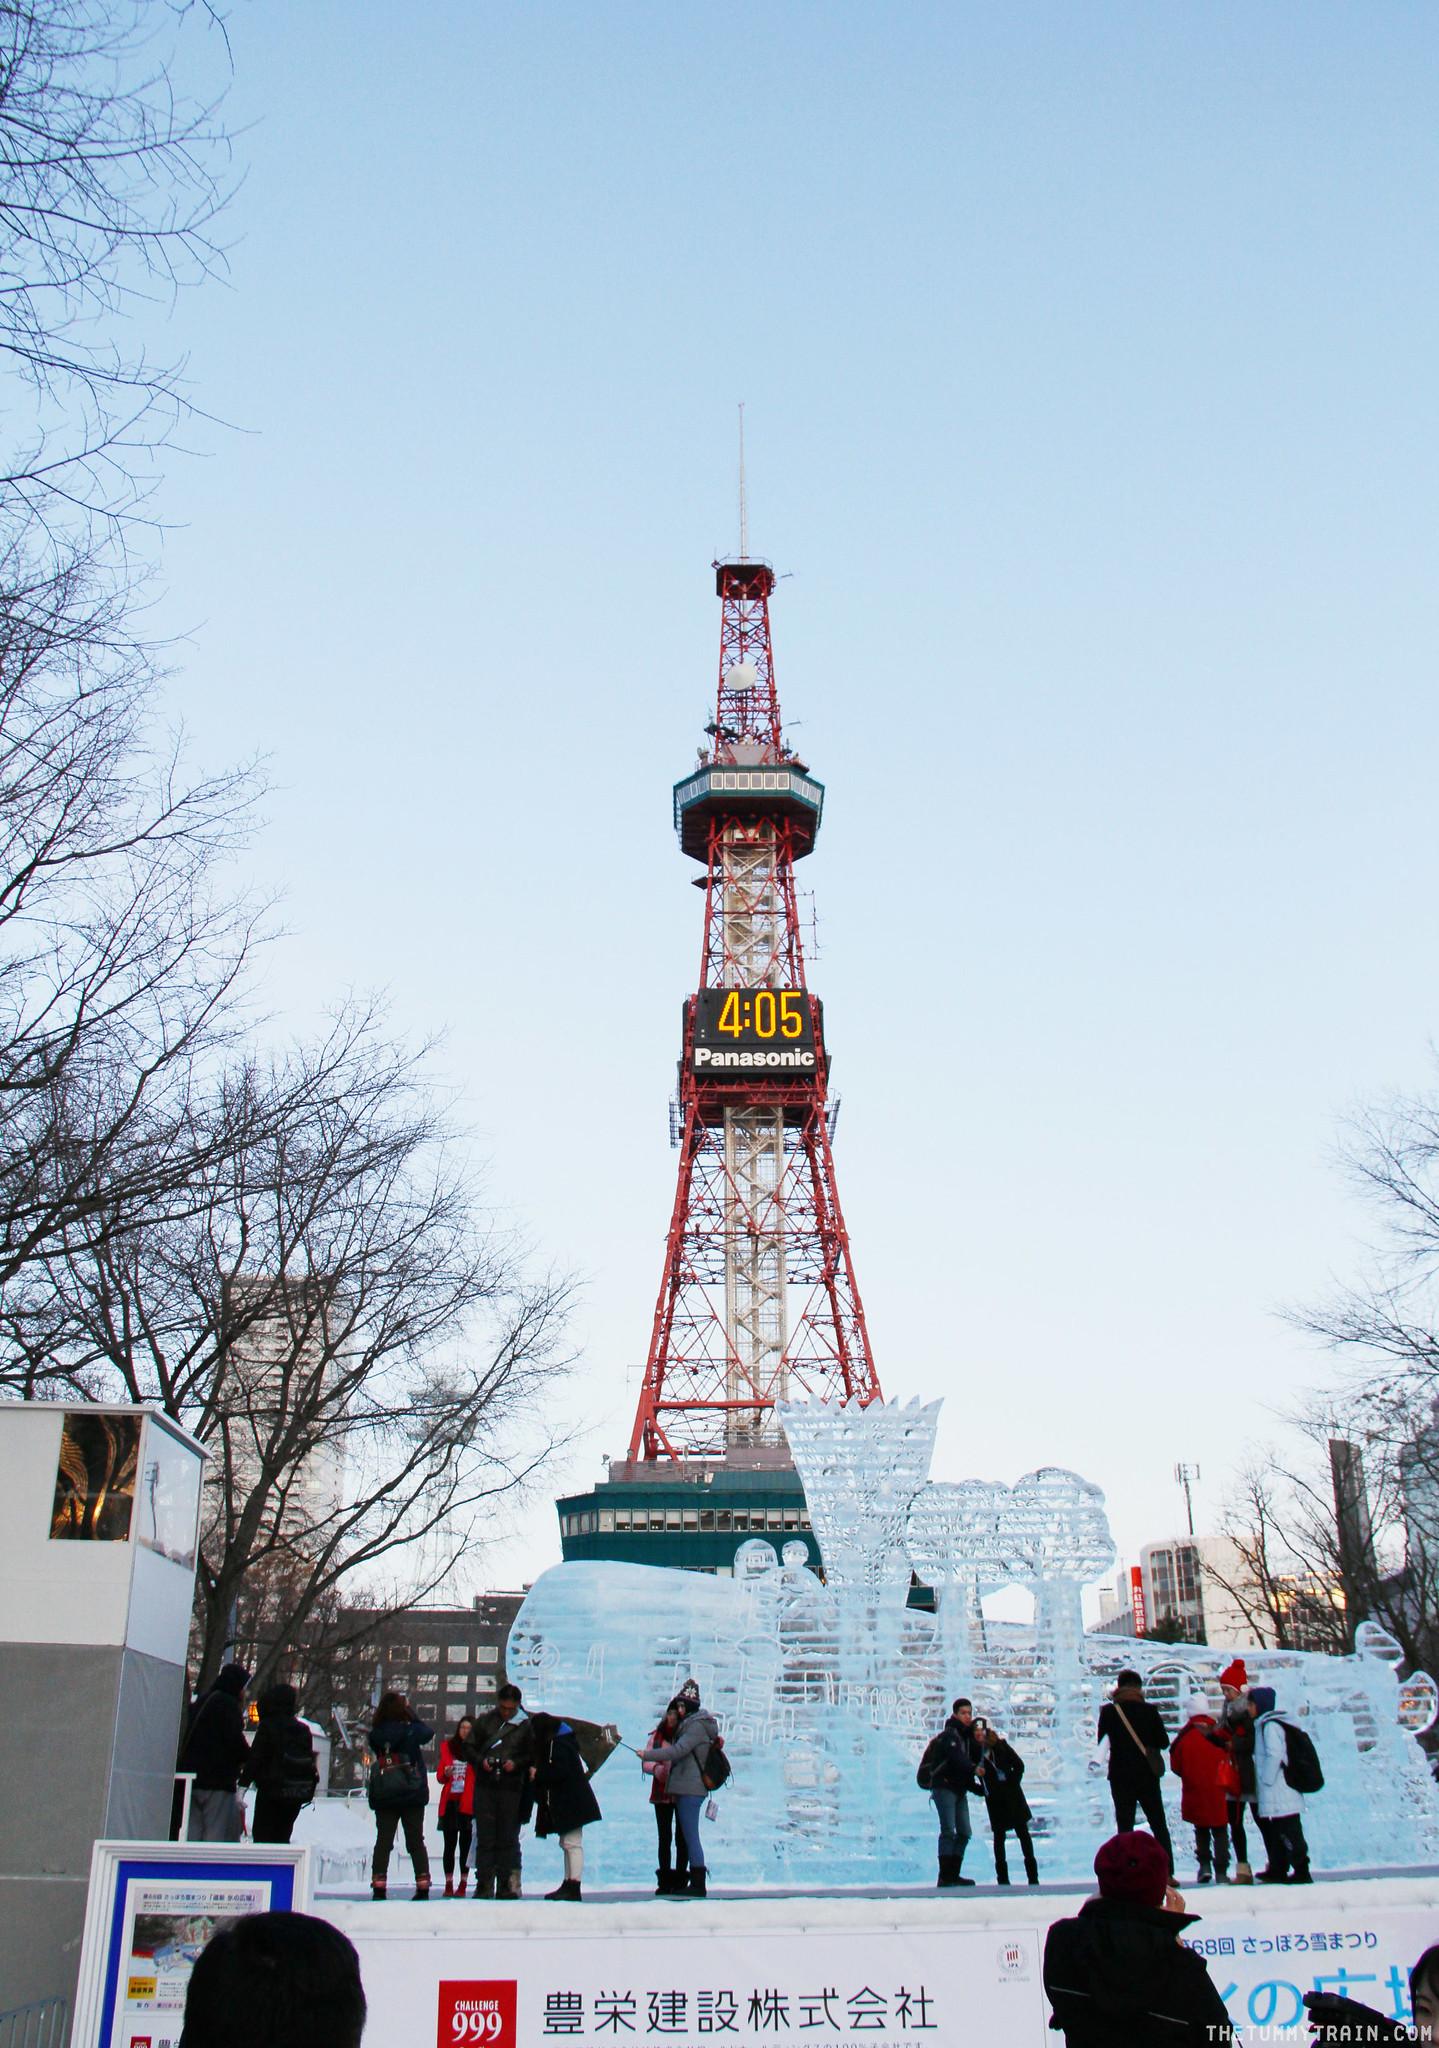 32877010766 20edc7cfc8 k - Sapporo Snow And Smile: 8 Unforgettable Winter Experiences in Sapporo City